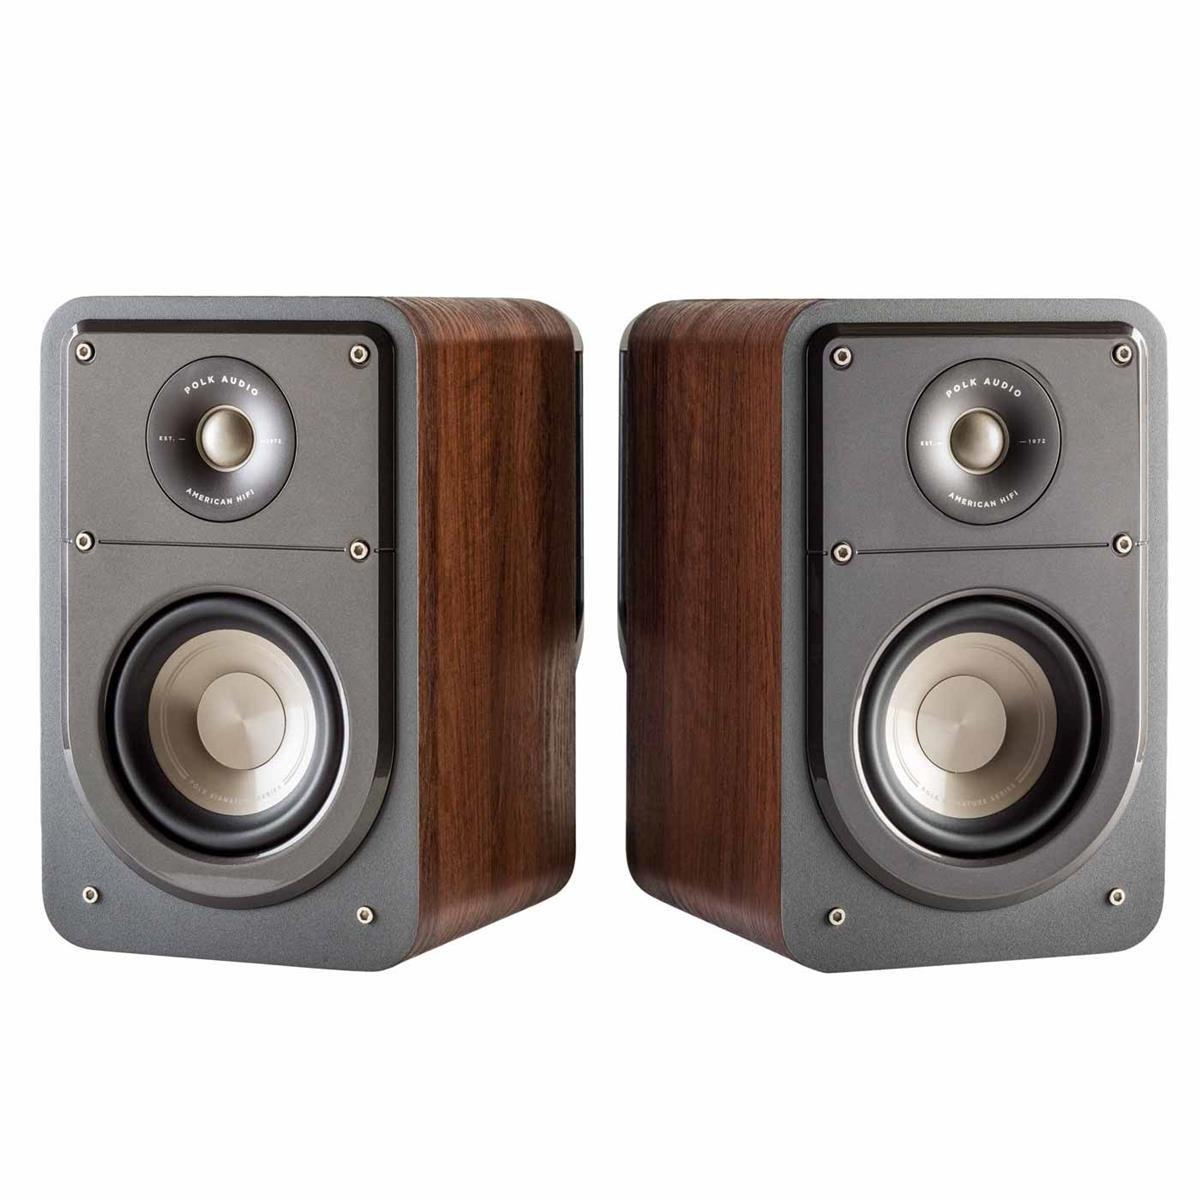 Polk Audio Signature Series S15 American Hi-Fi Home Theater Small Bookshelf Speakers - Pair (Classic Brown Walnut)